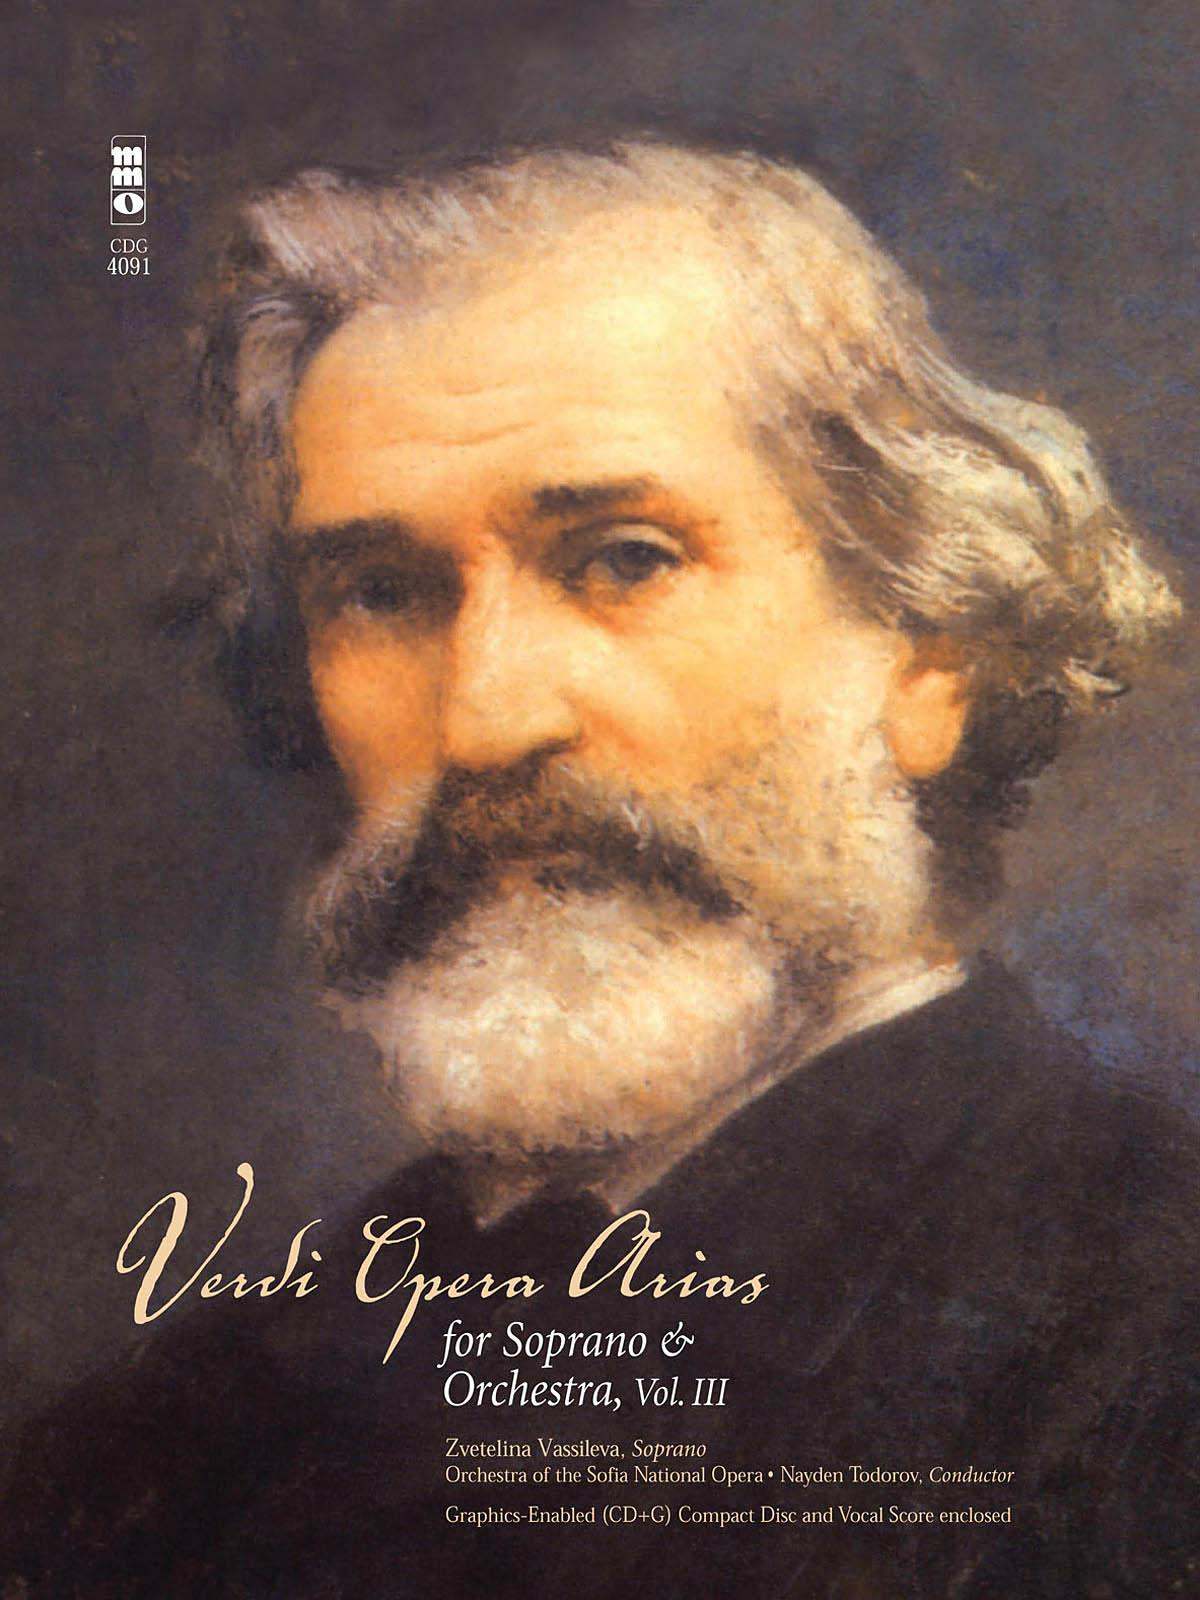 Giuseppe Verdi: Opera Arias for Soprano & Orchestra  Volume III: Vocal Solo: